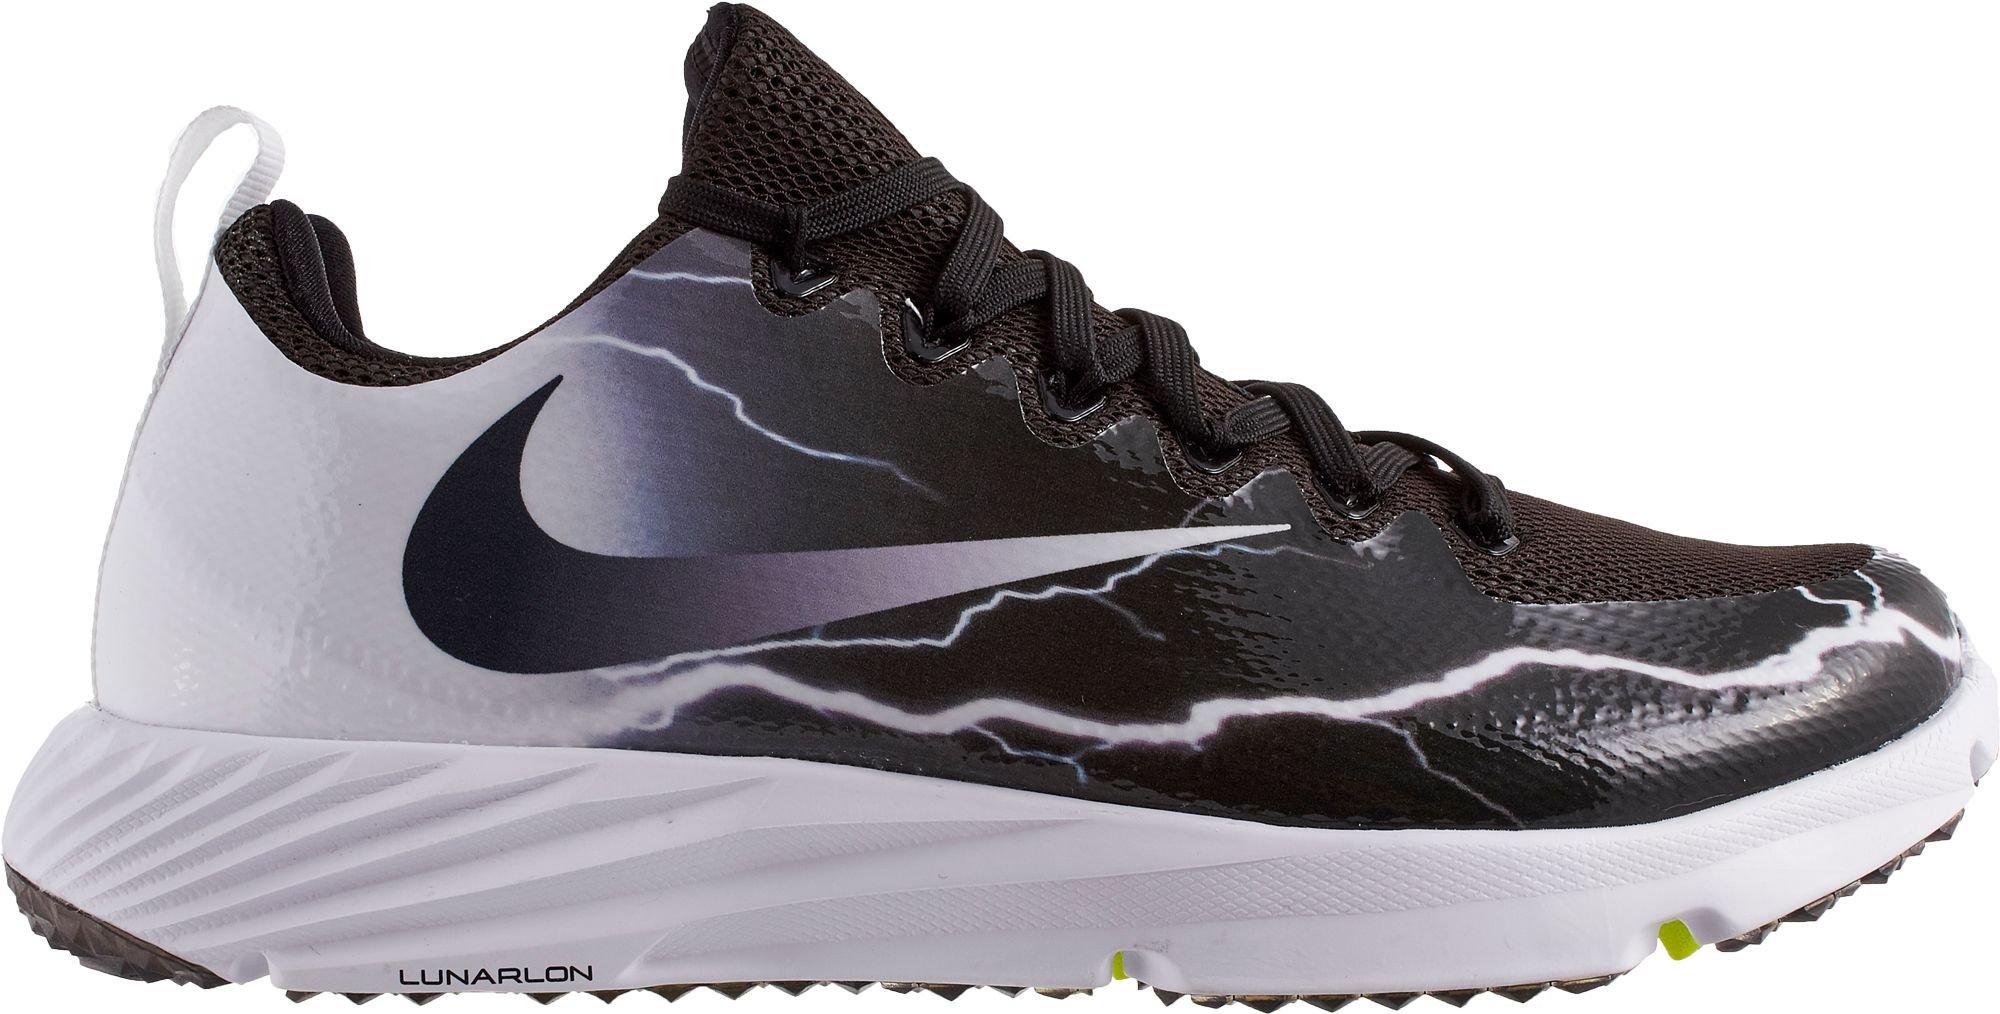 NIKE Men's Vapor Speed Turf Football Shoe, 12.5 product image